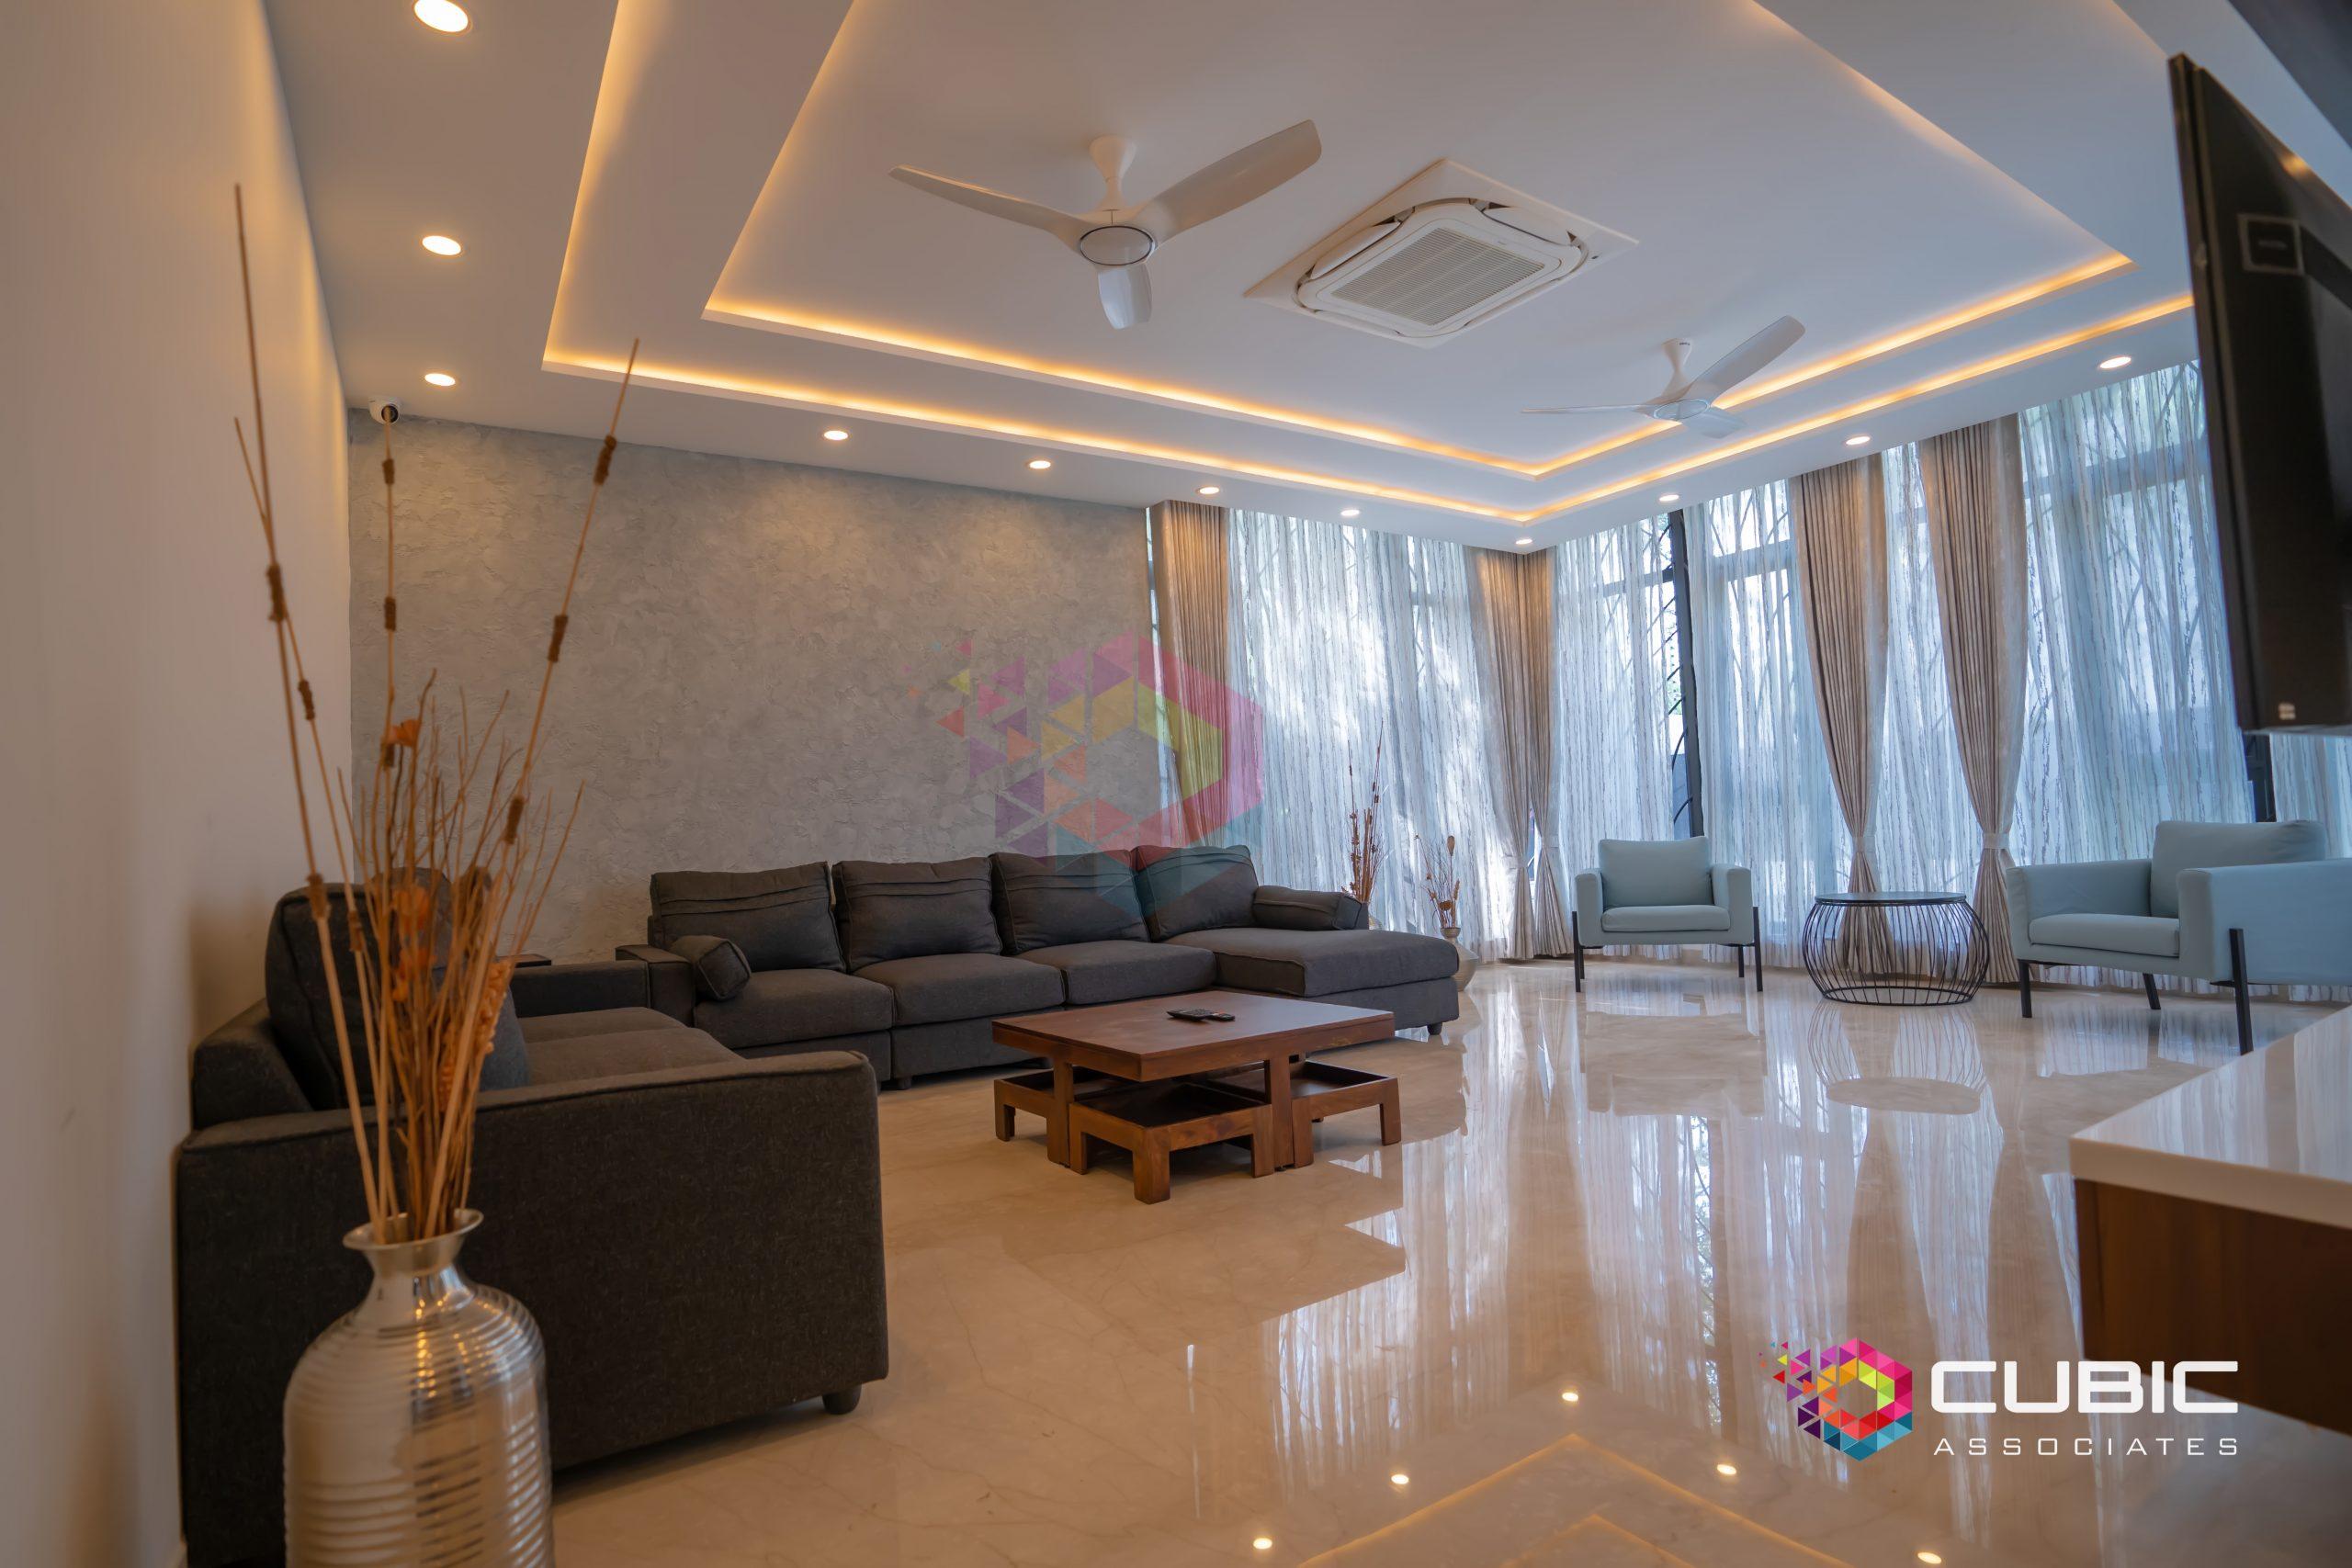 Hall decors